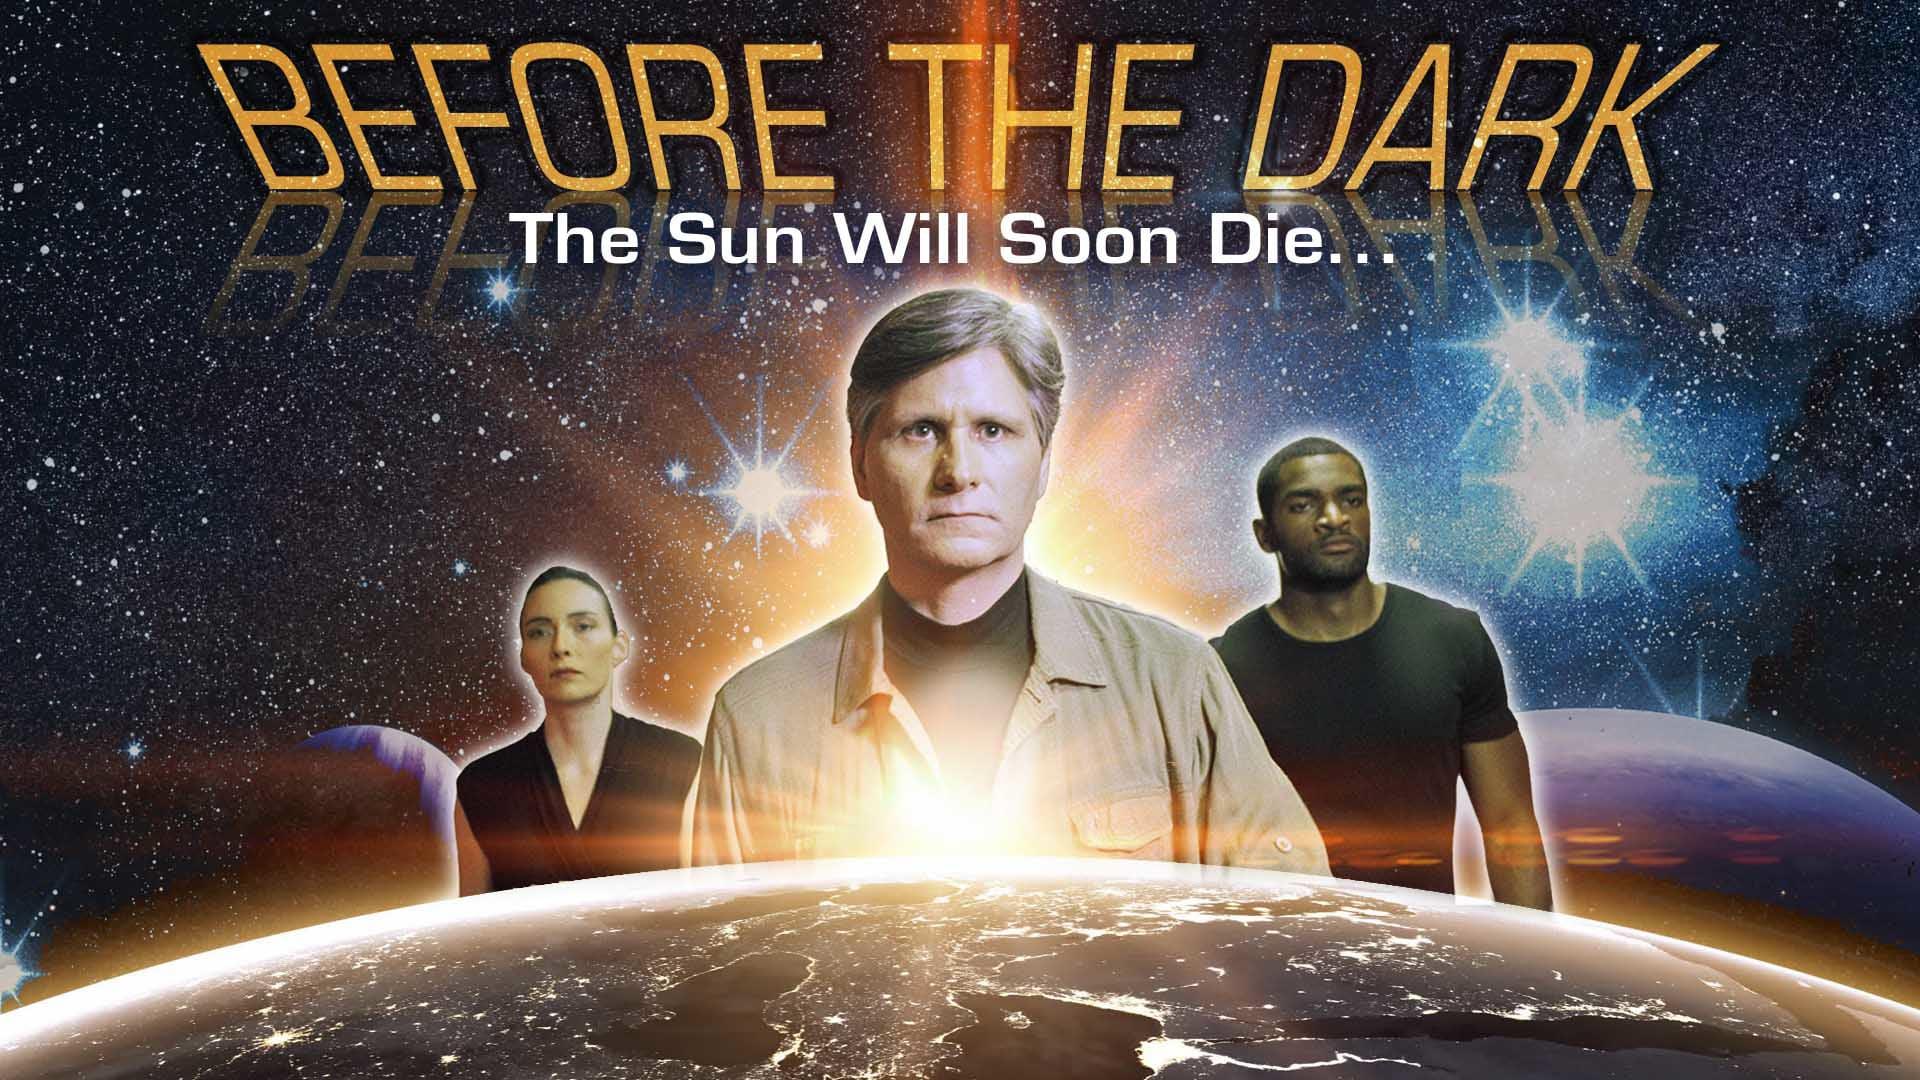 Before the Dark - Trailer